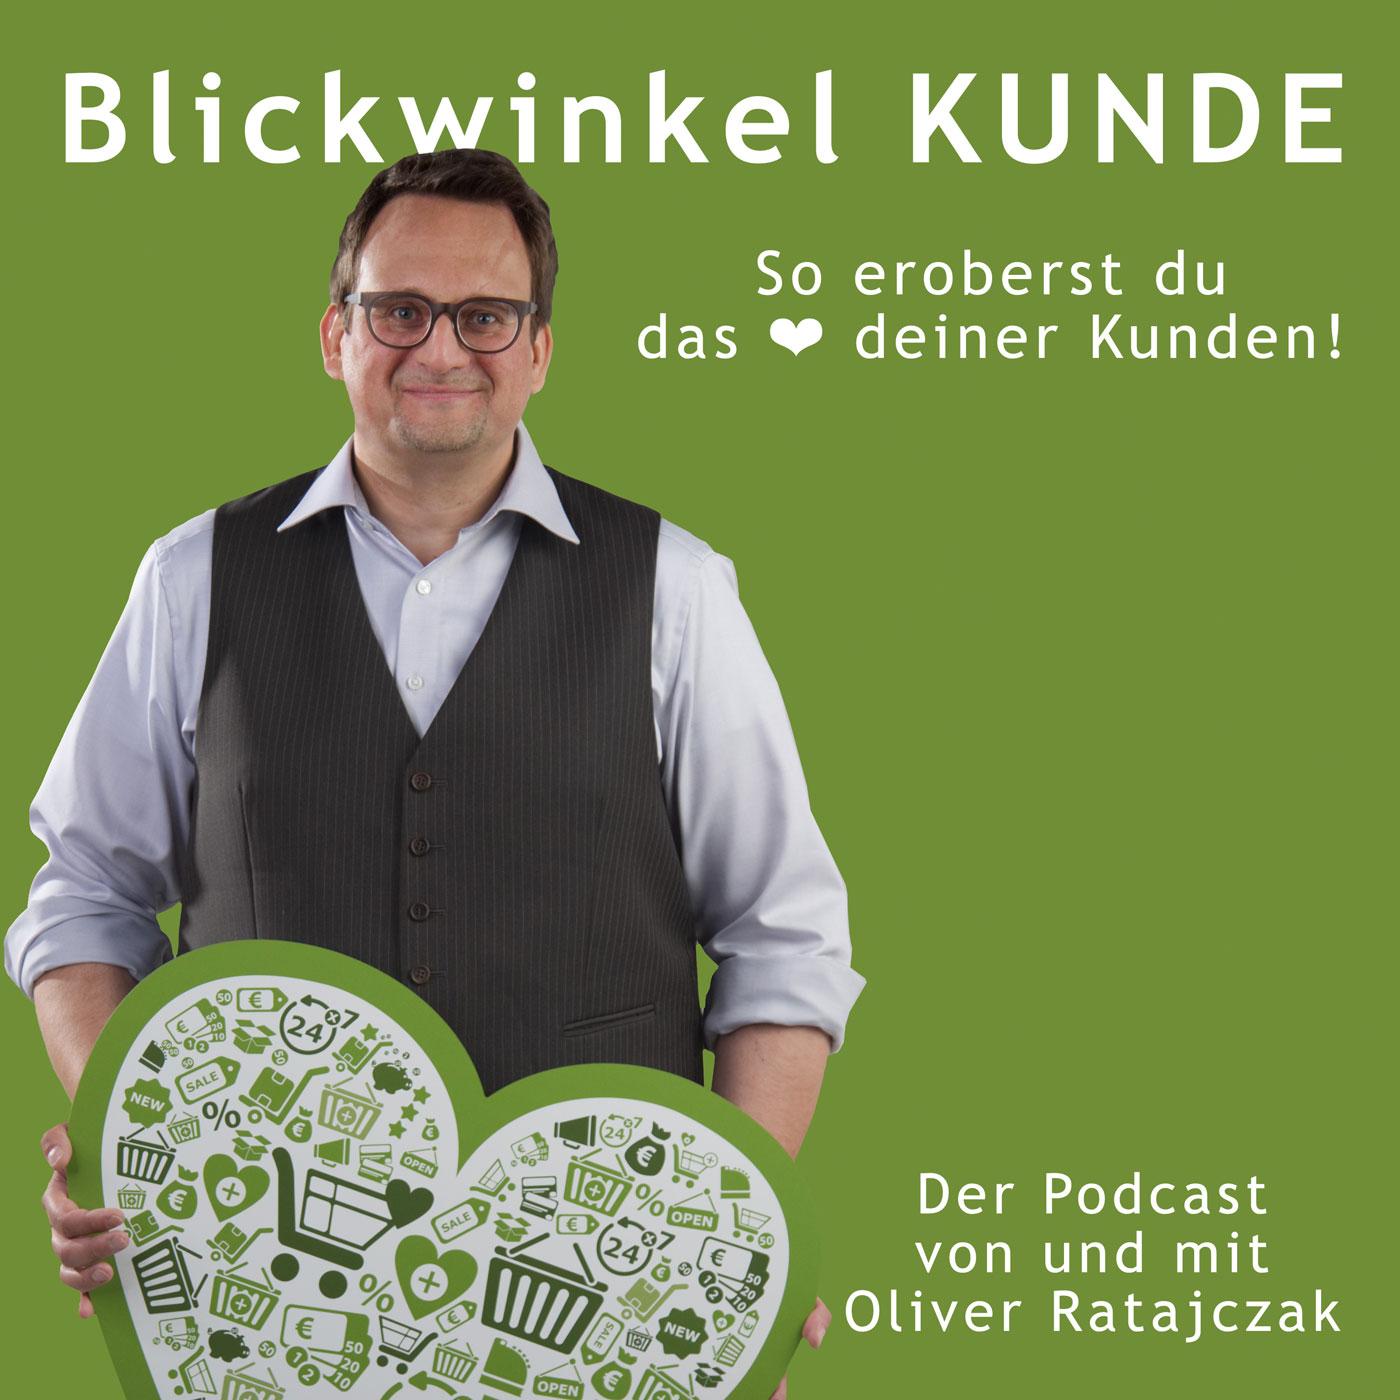 Blickwinkel KUNDE ❤ So eroberst du das Kundenherz!